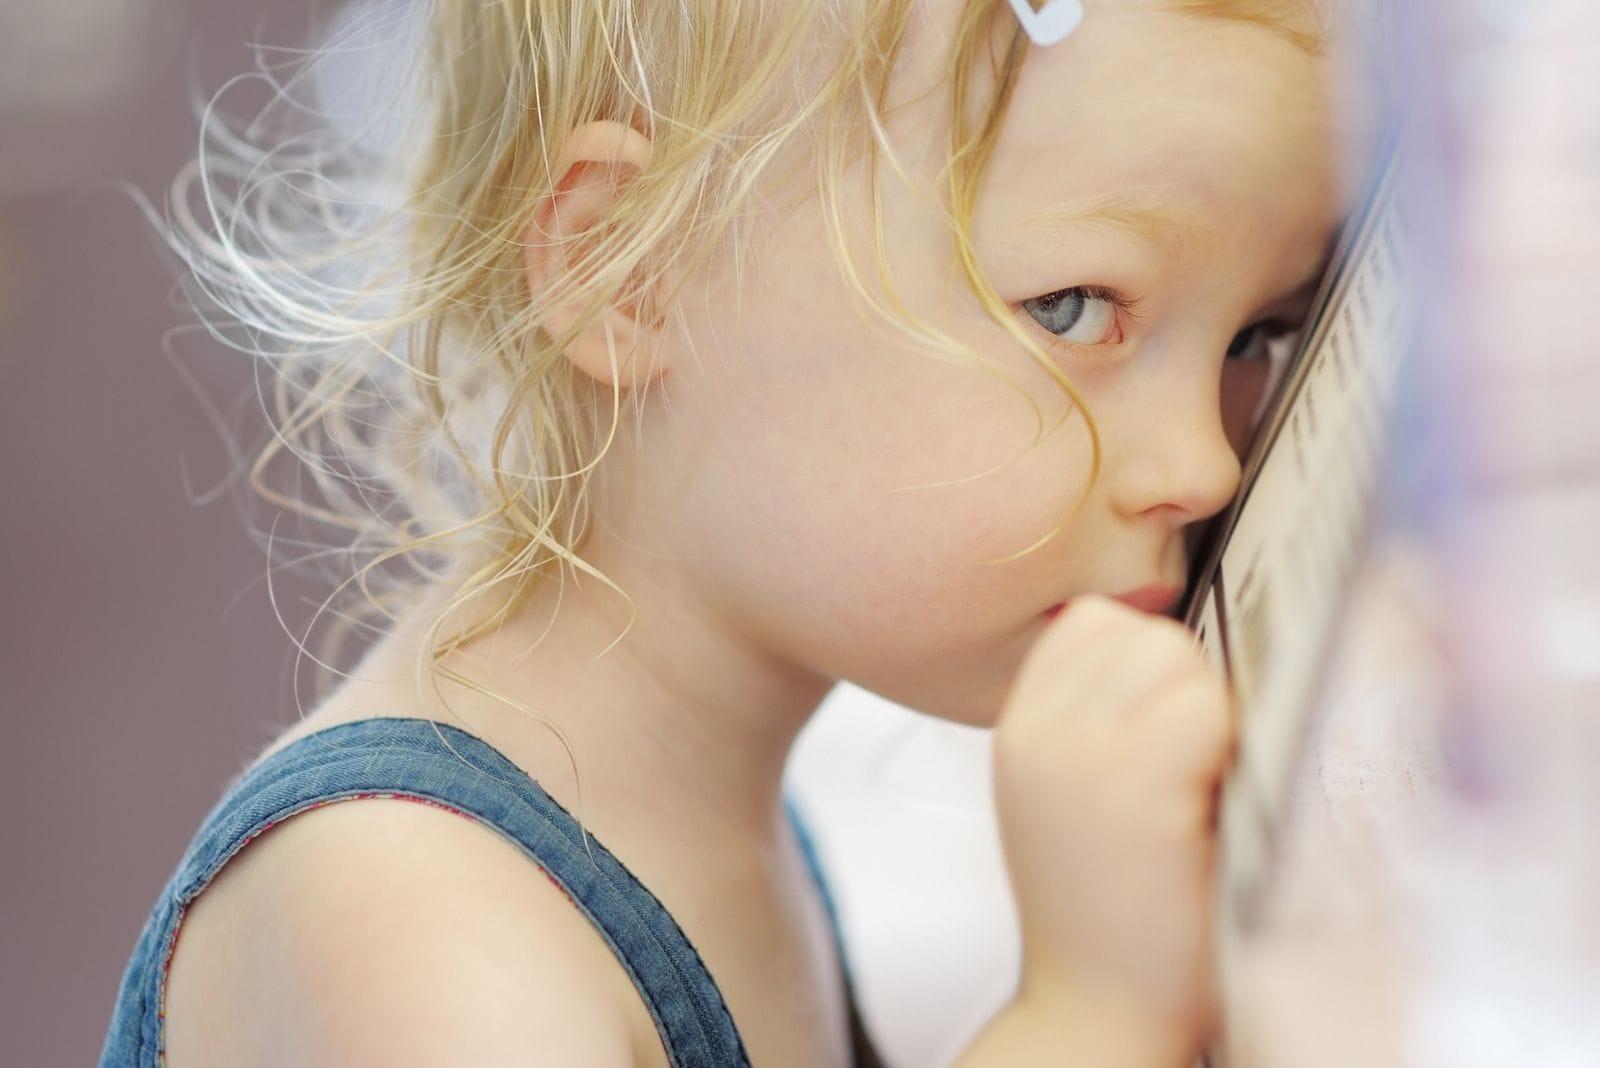 shy little girl portrait in the cafe hiding